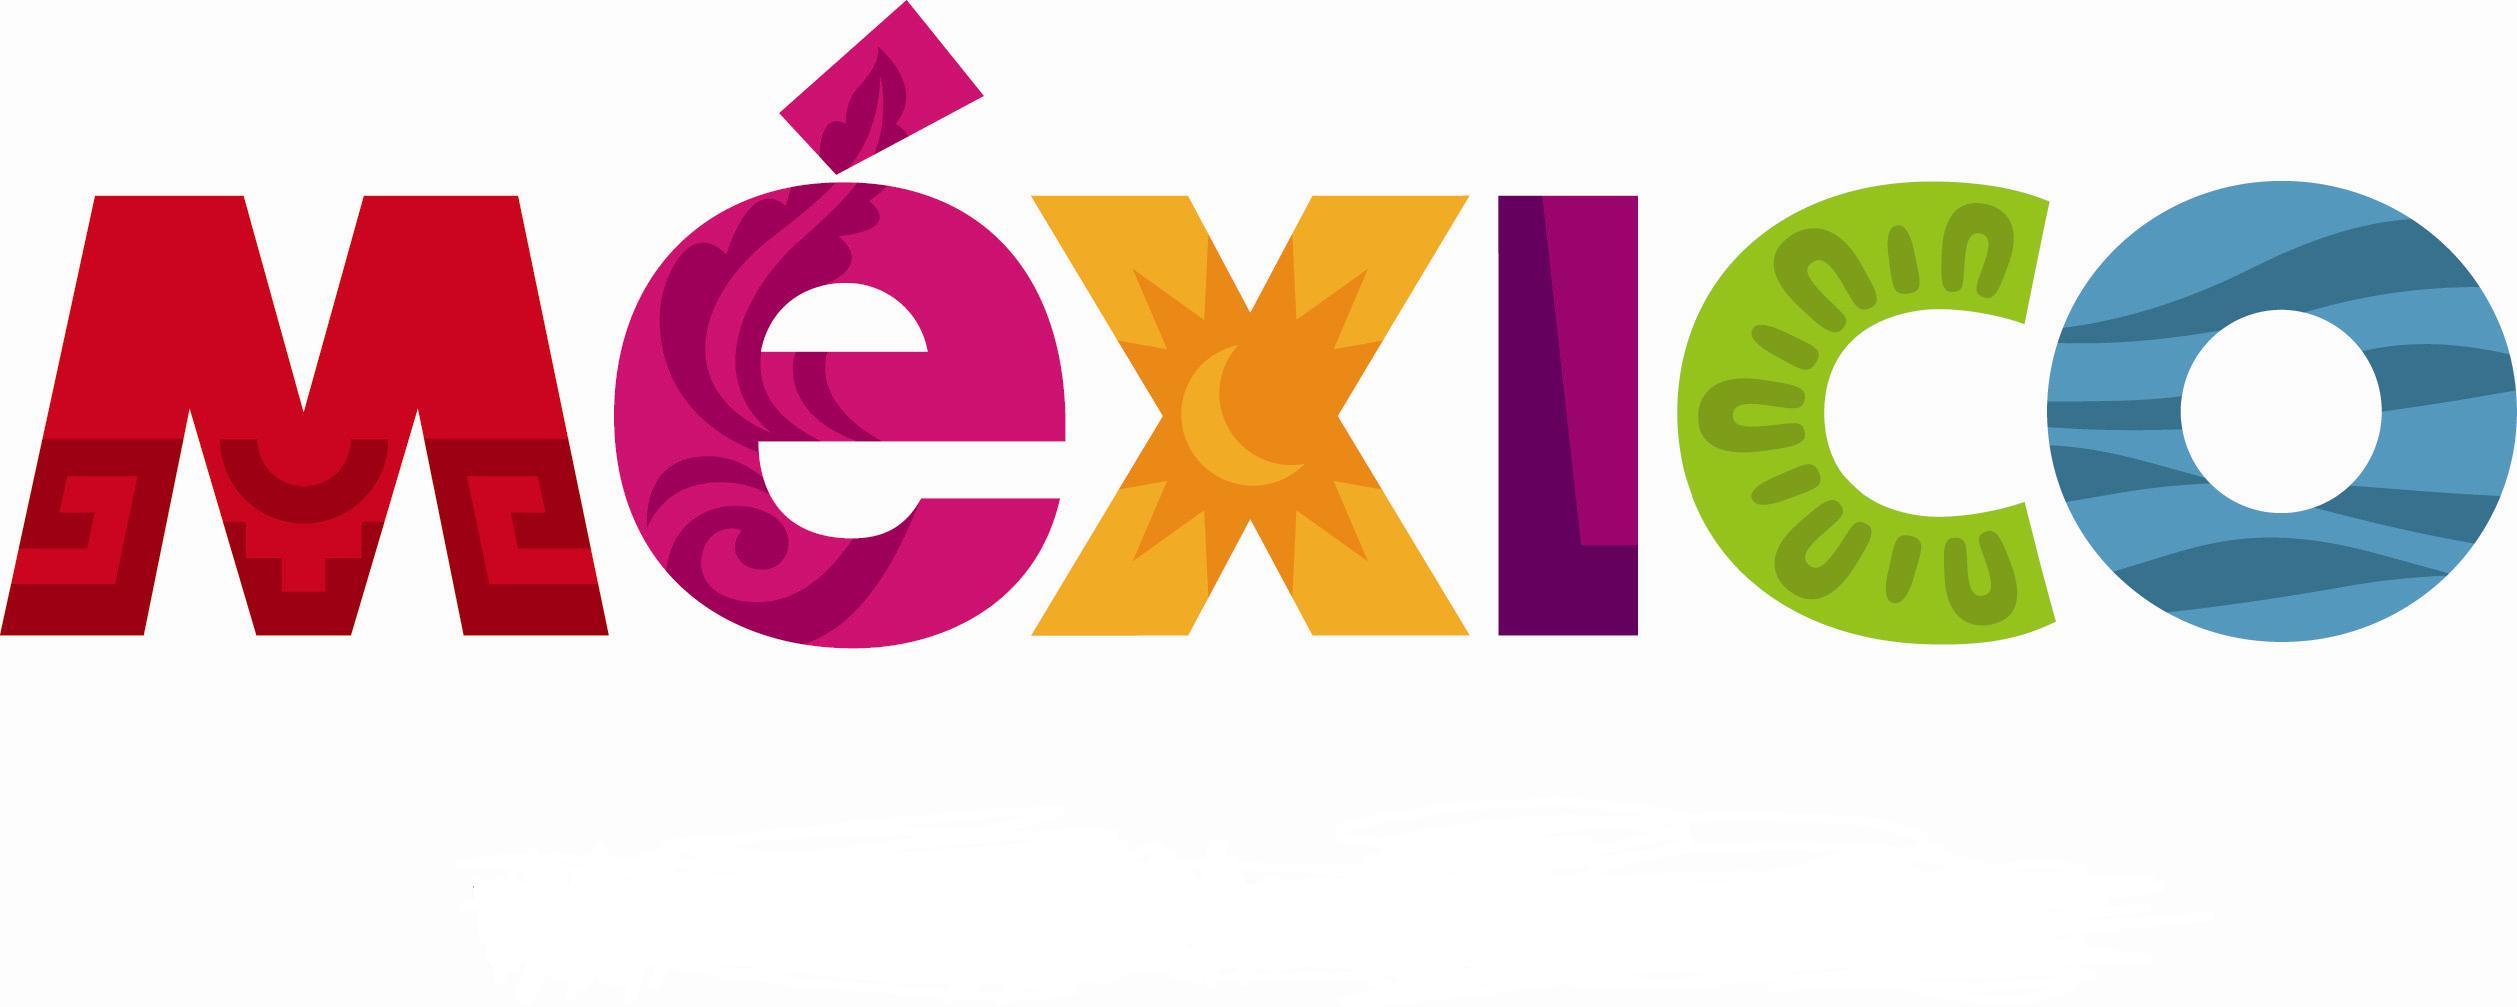 imagen mexico: